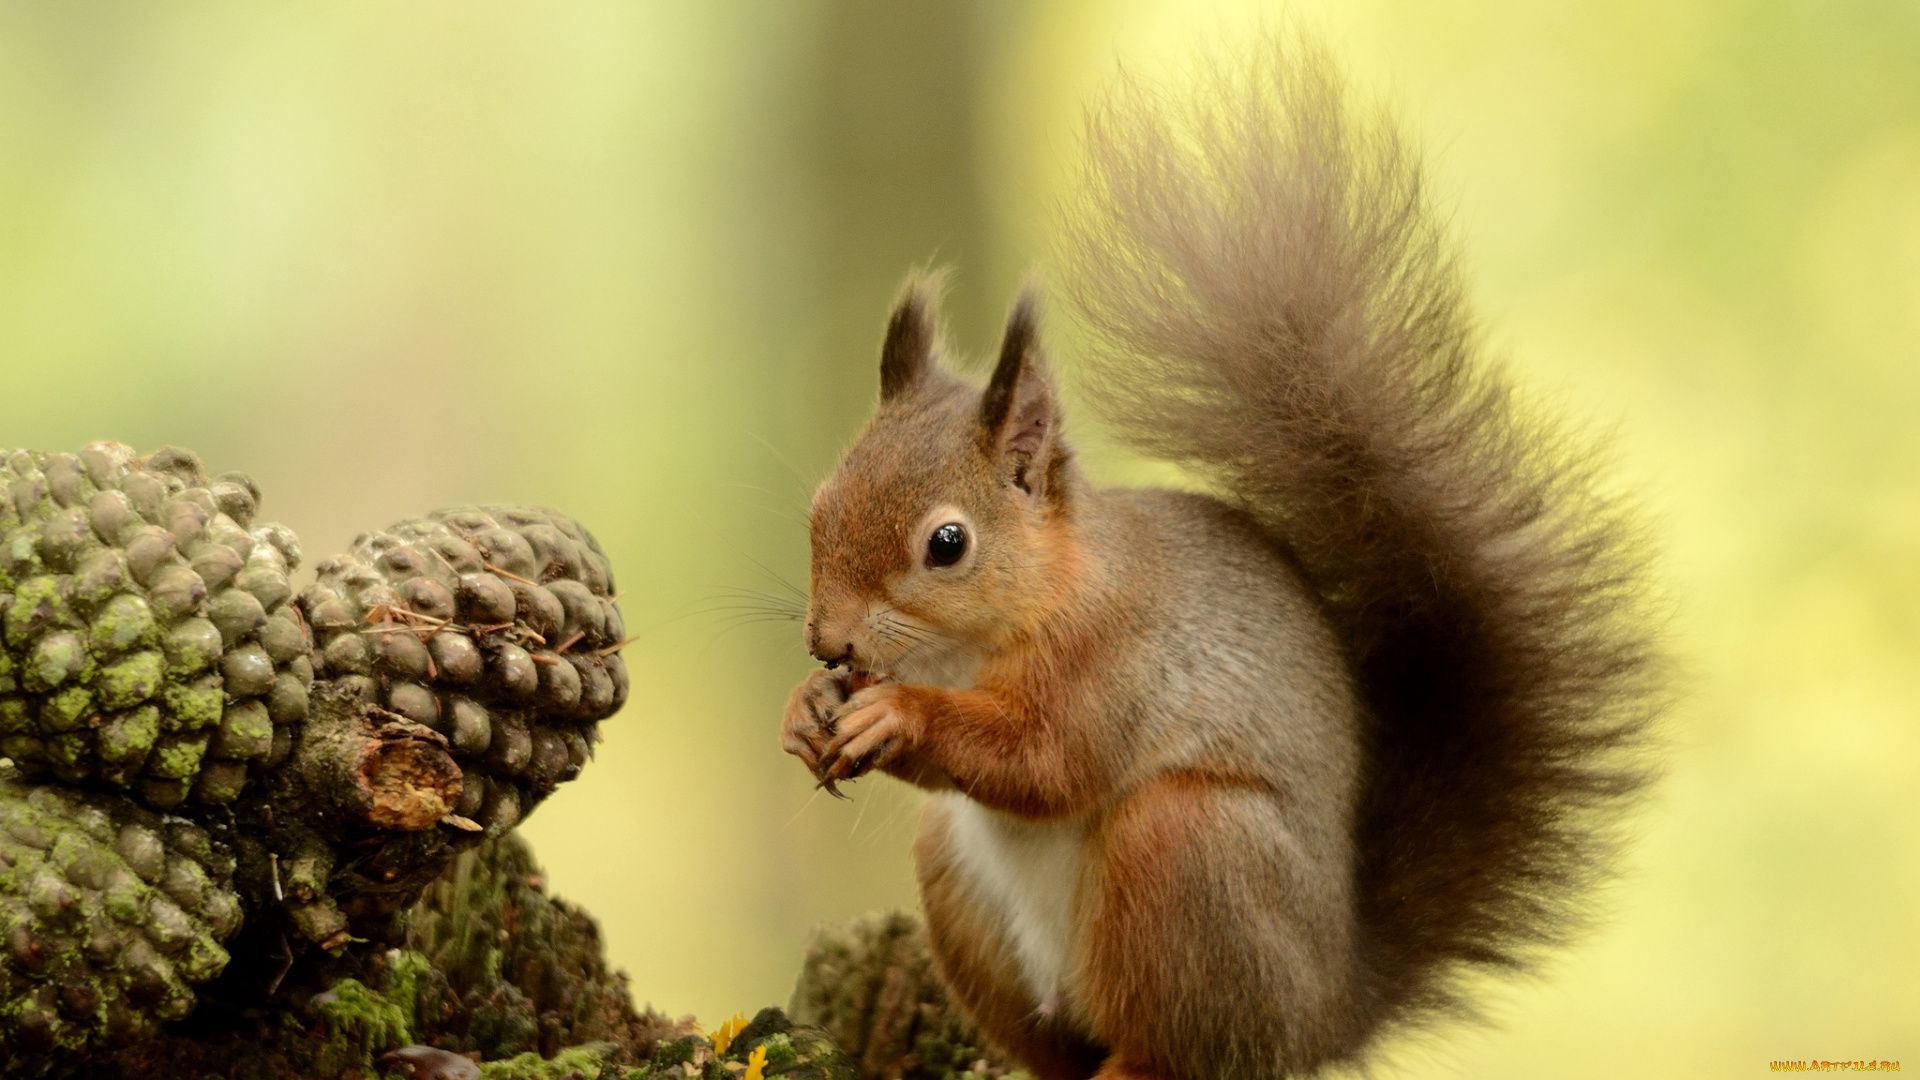 The Teleut Squirrel Photo